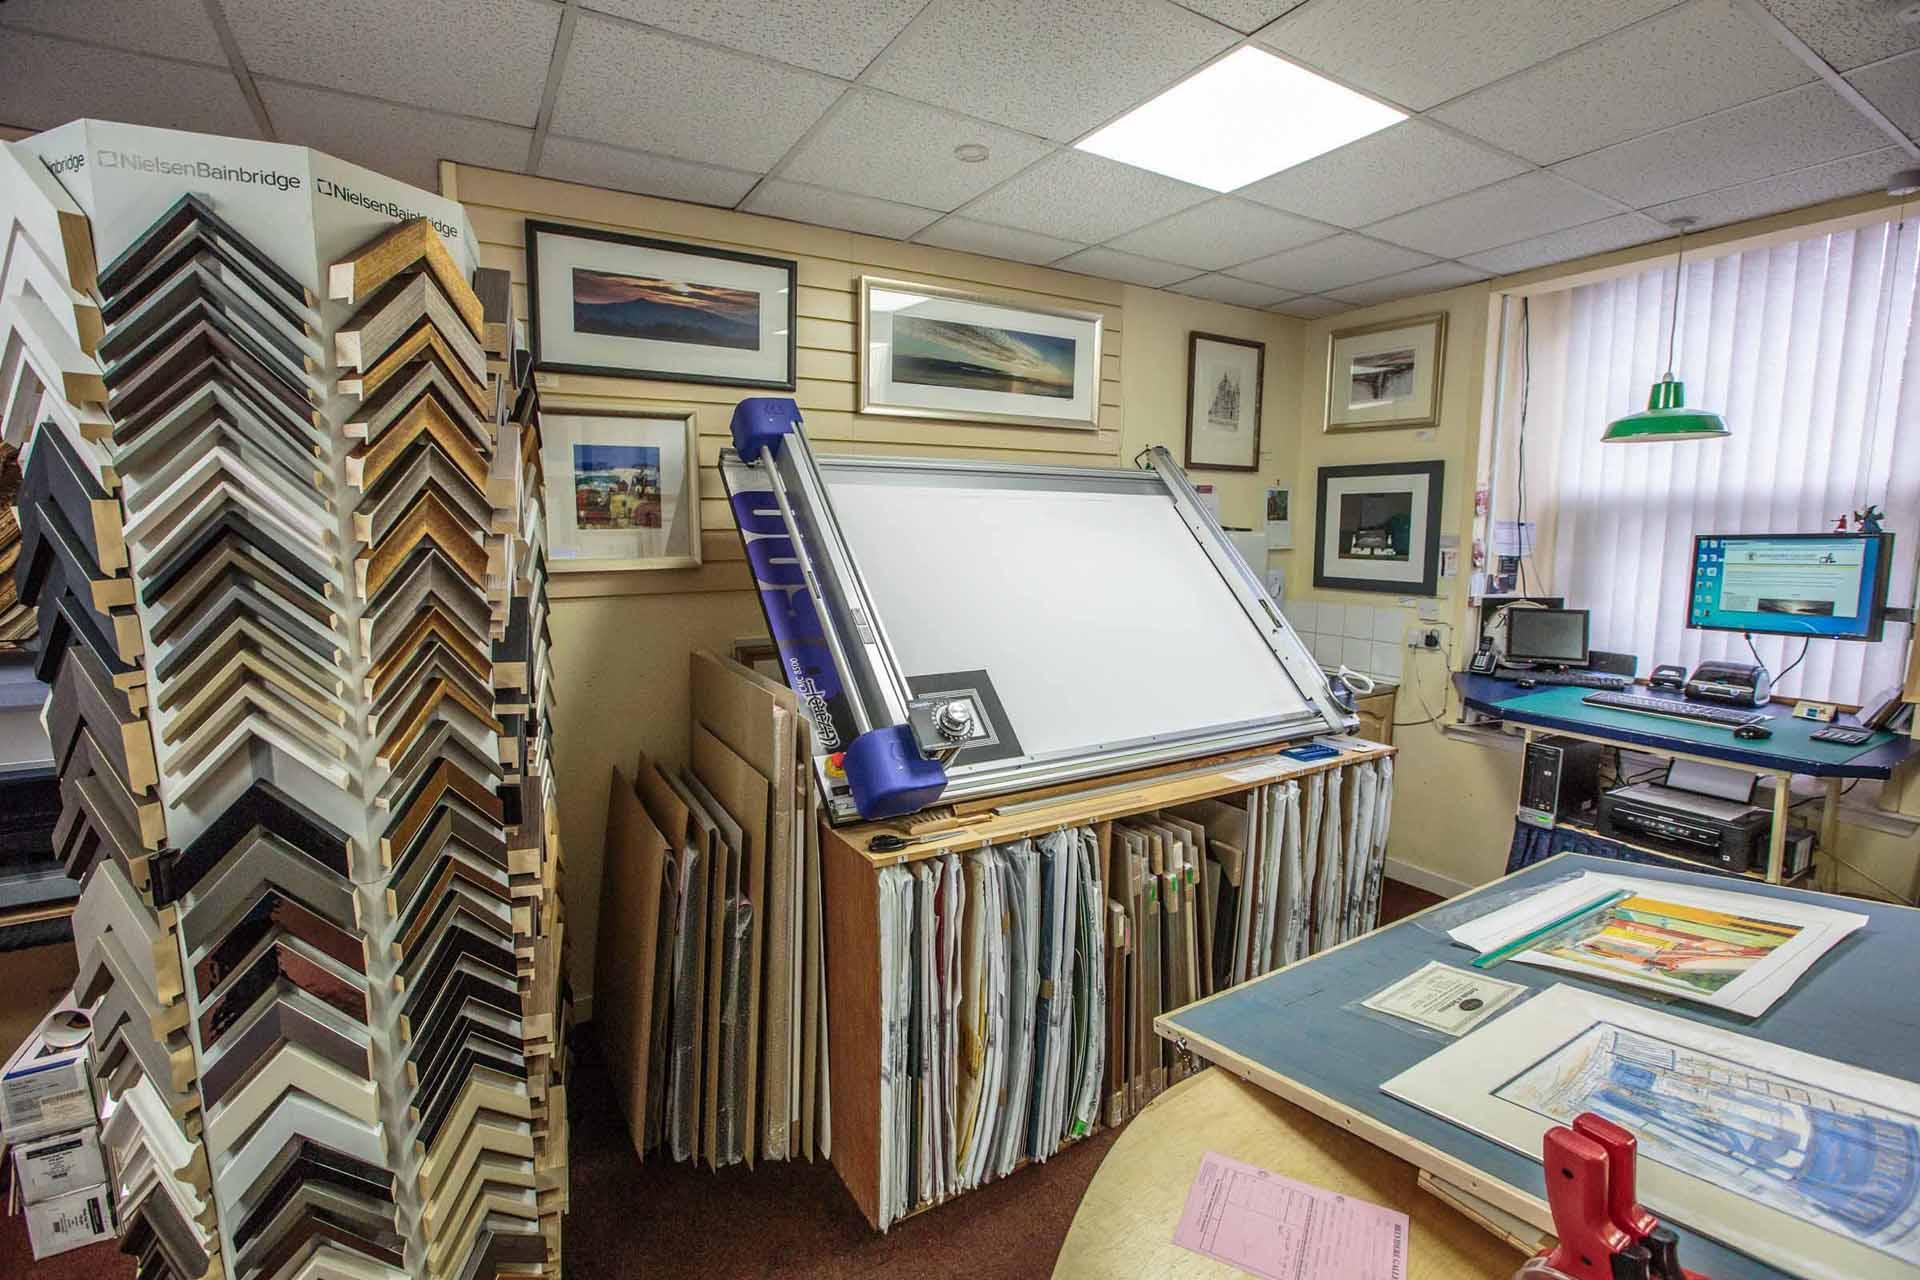 Inside Belvidere Gallery